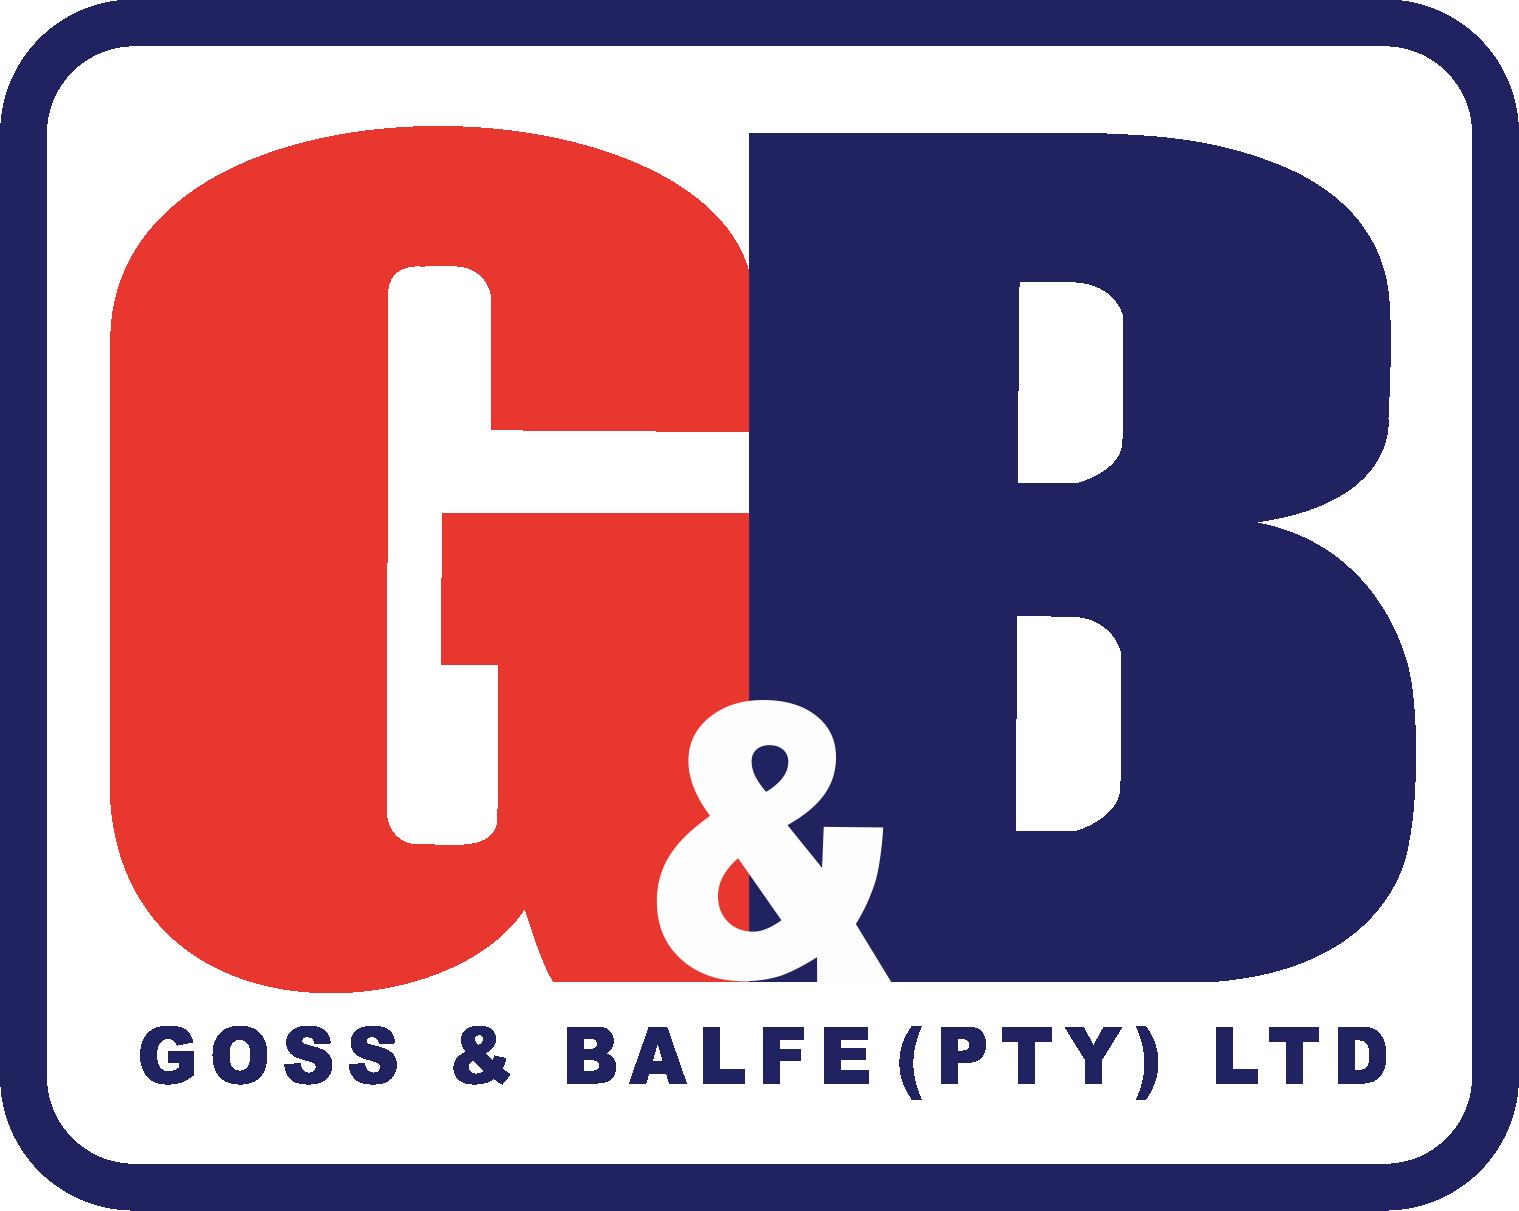 Goss & Balfe